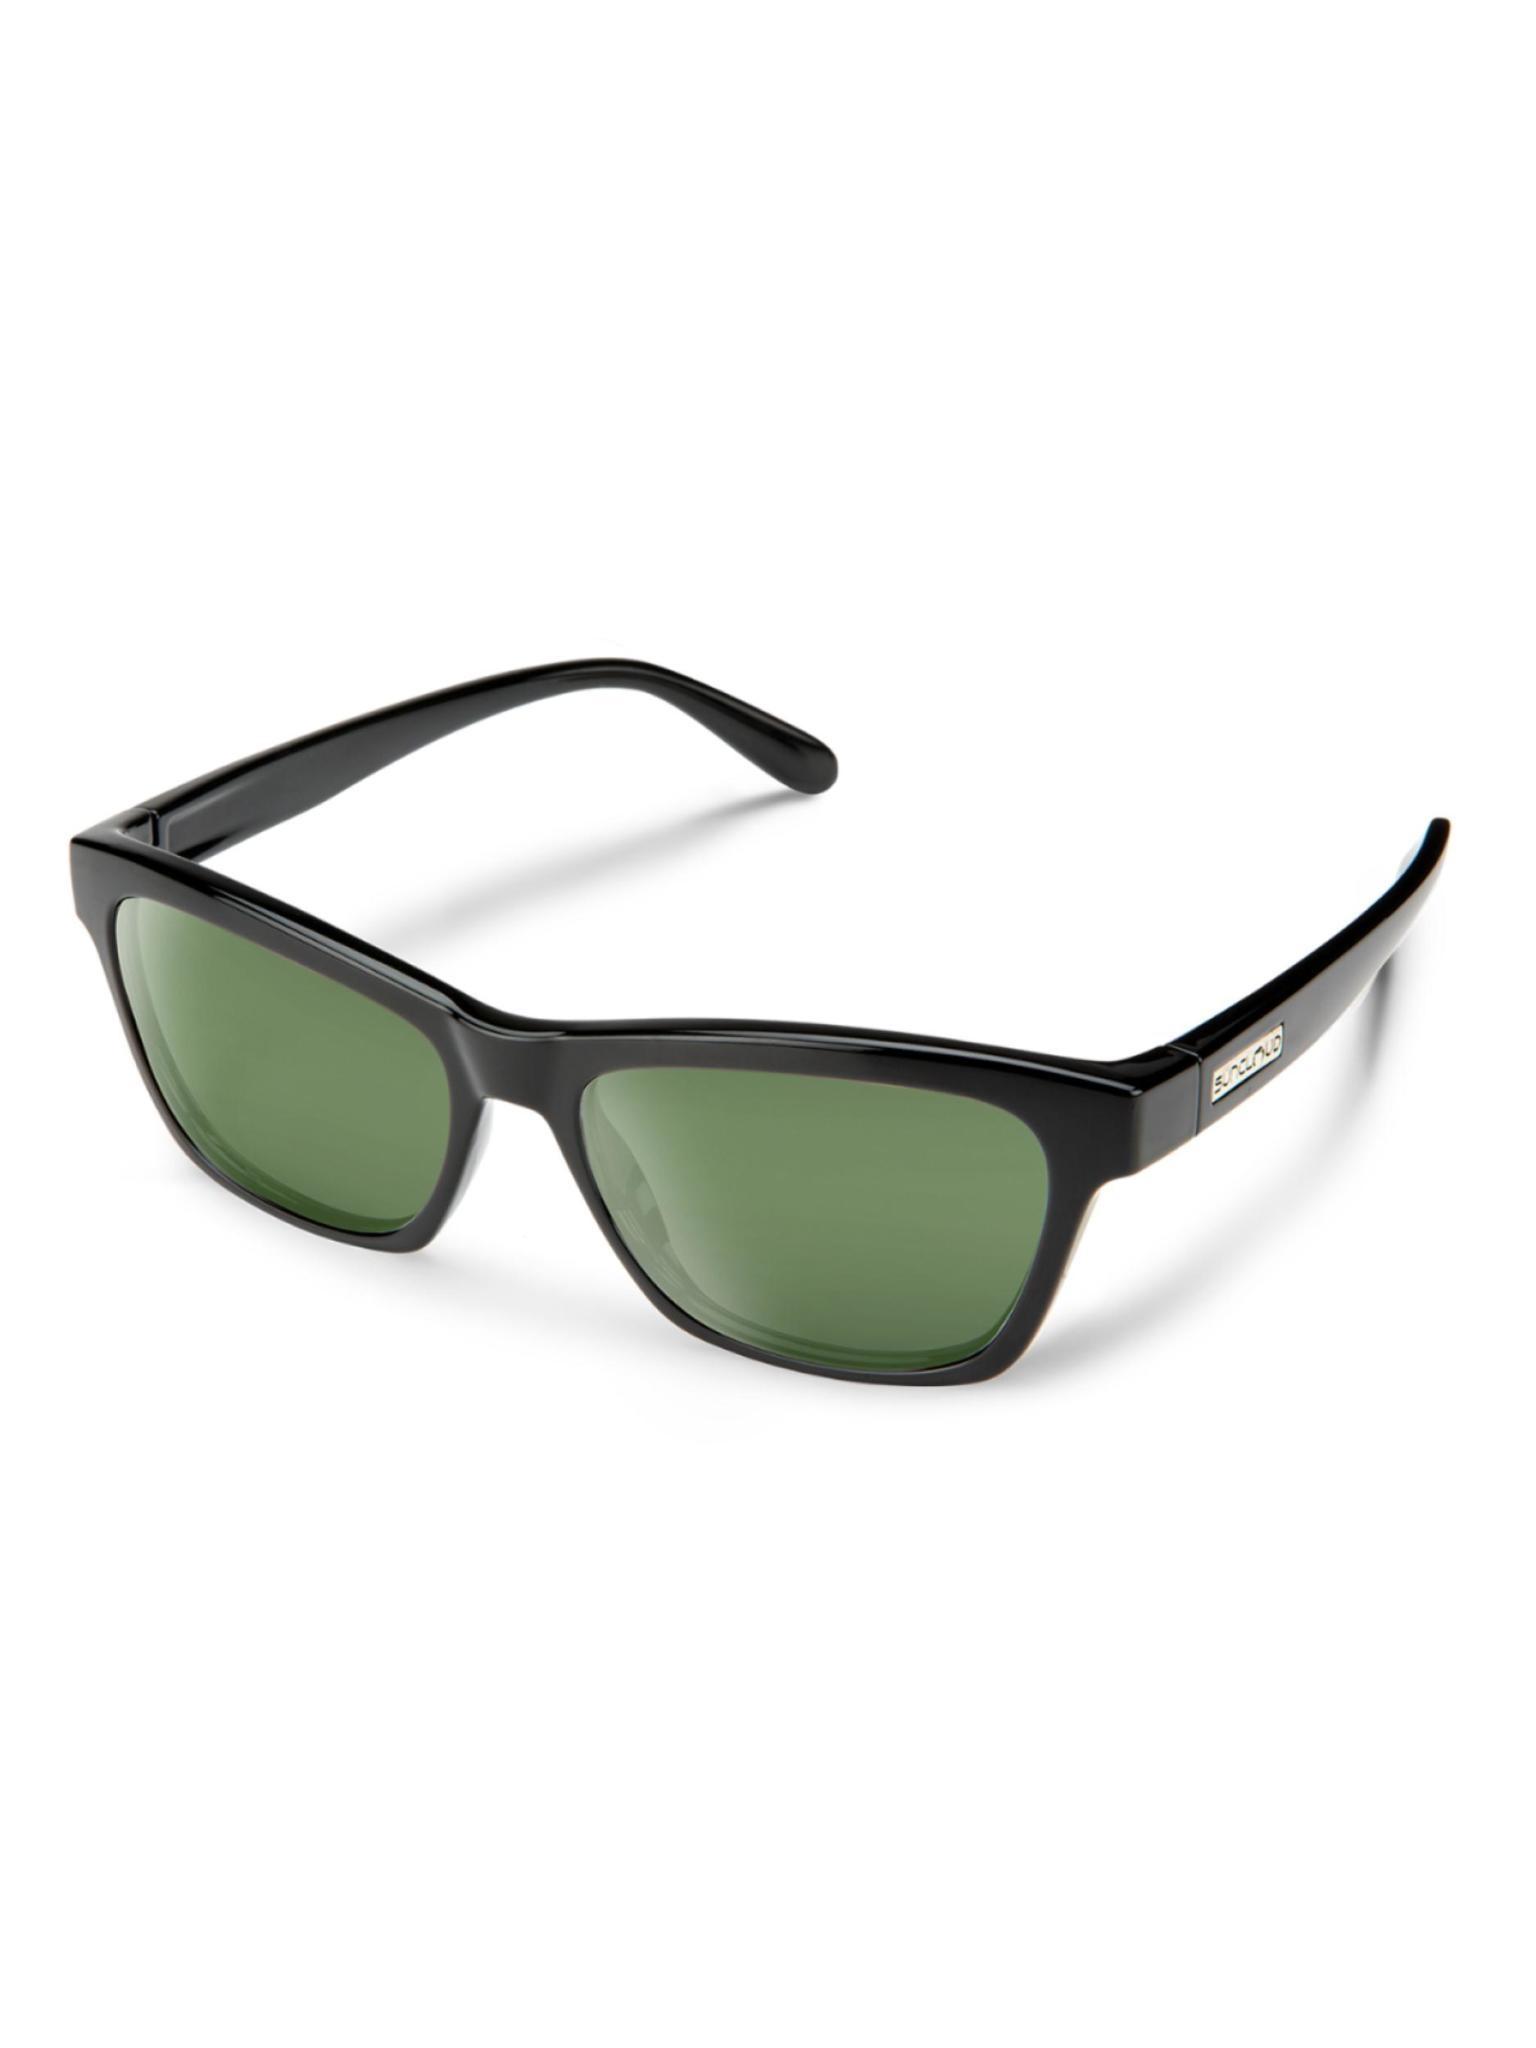 Quest Black Polarized Gray Green